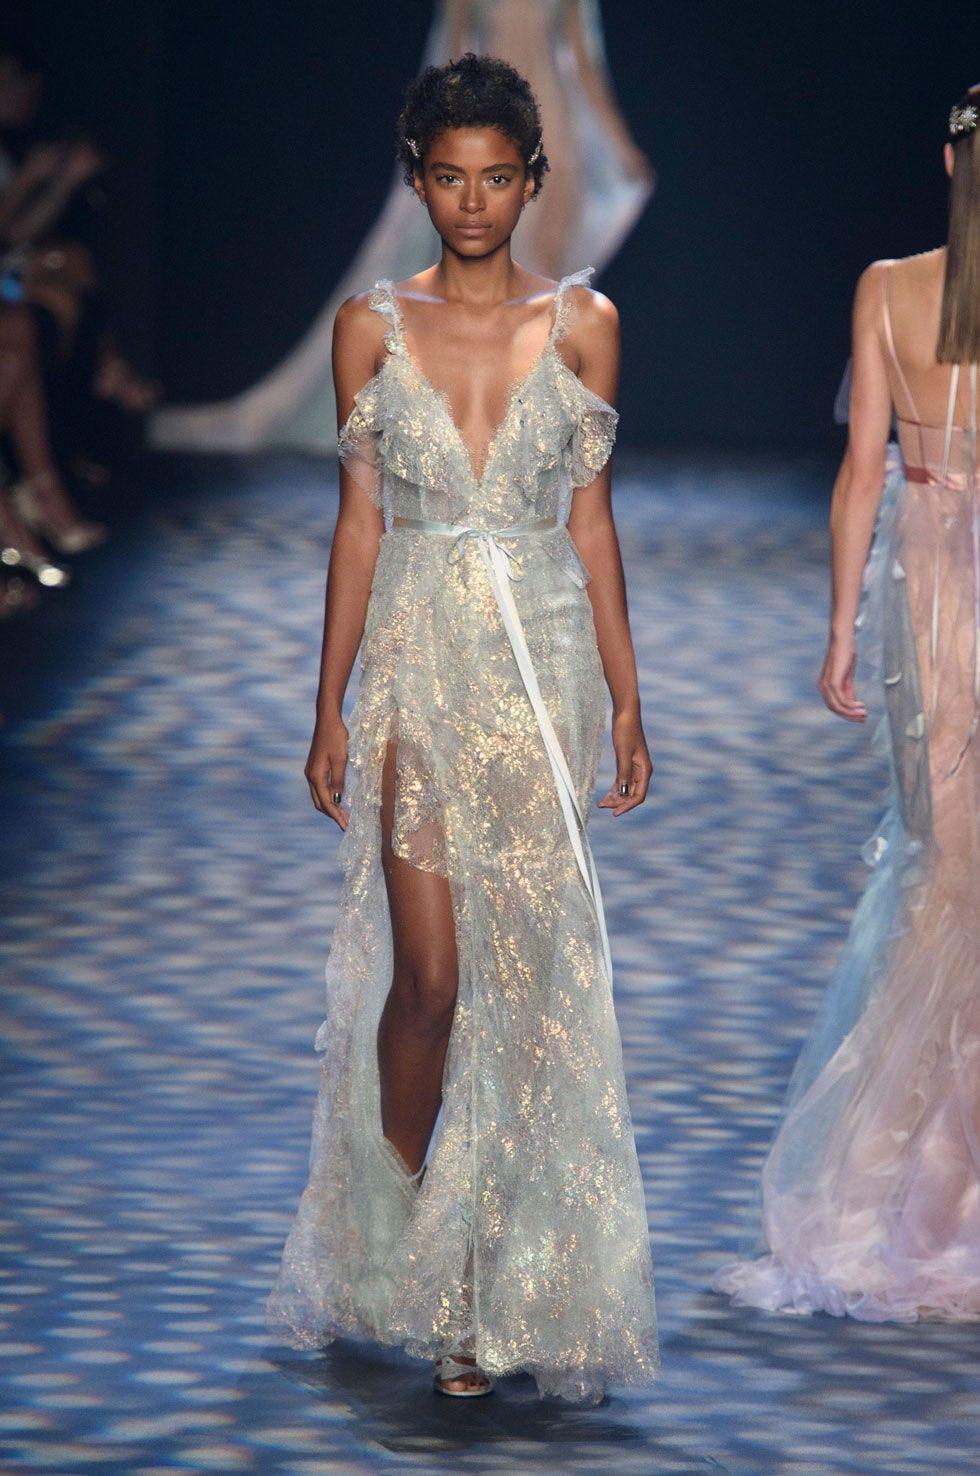 Fashion show, Hairstyle, Dress, Shoulder, Runway, Waist, Gown, Formal wear, Style, One-piece garment,